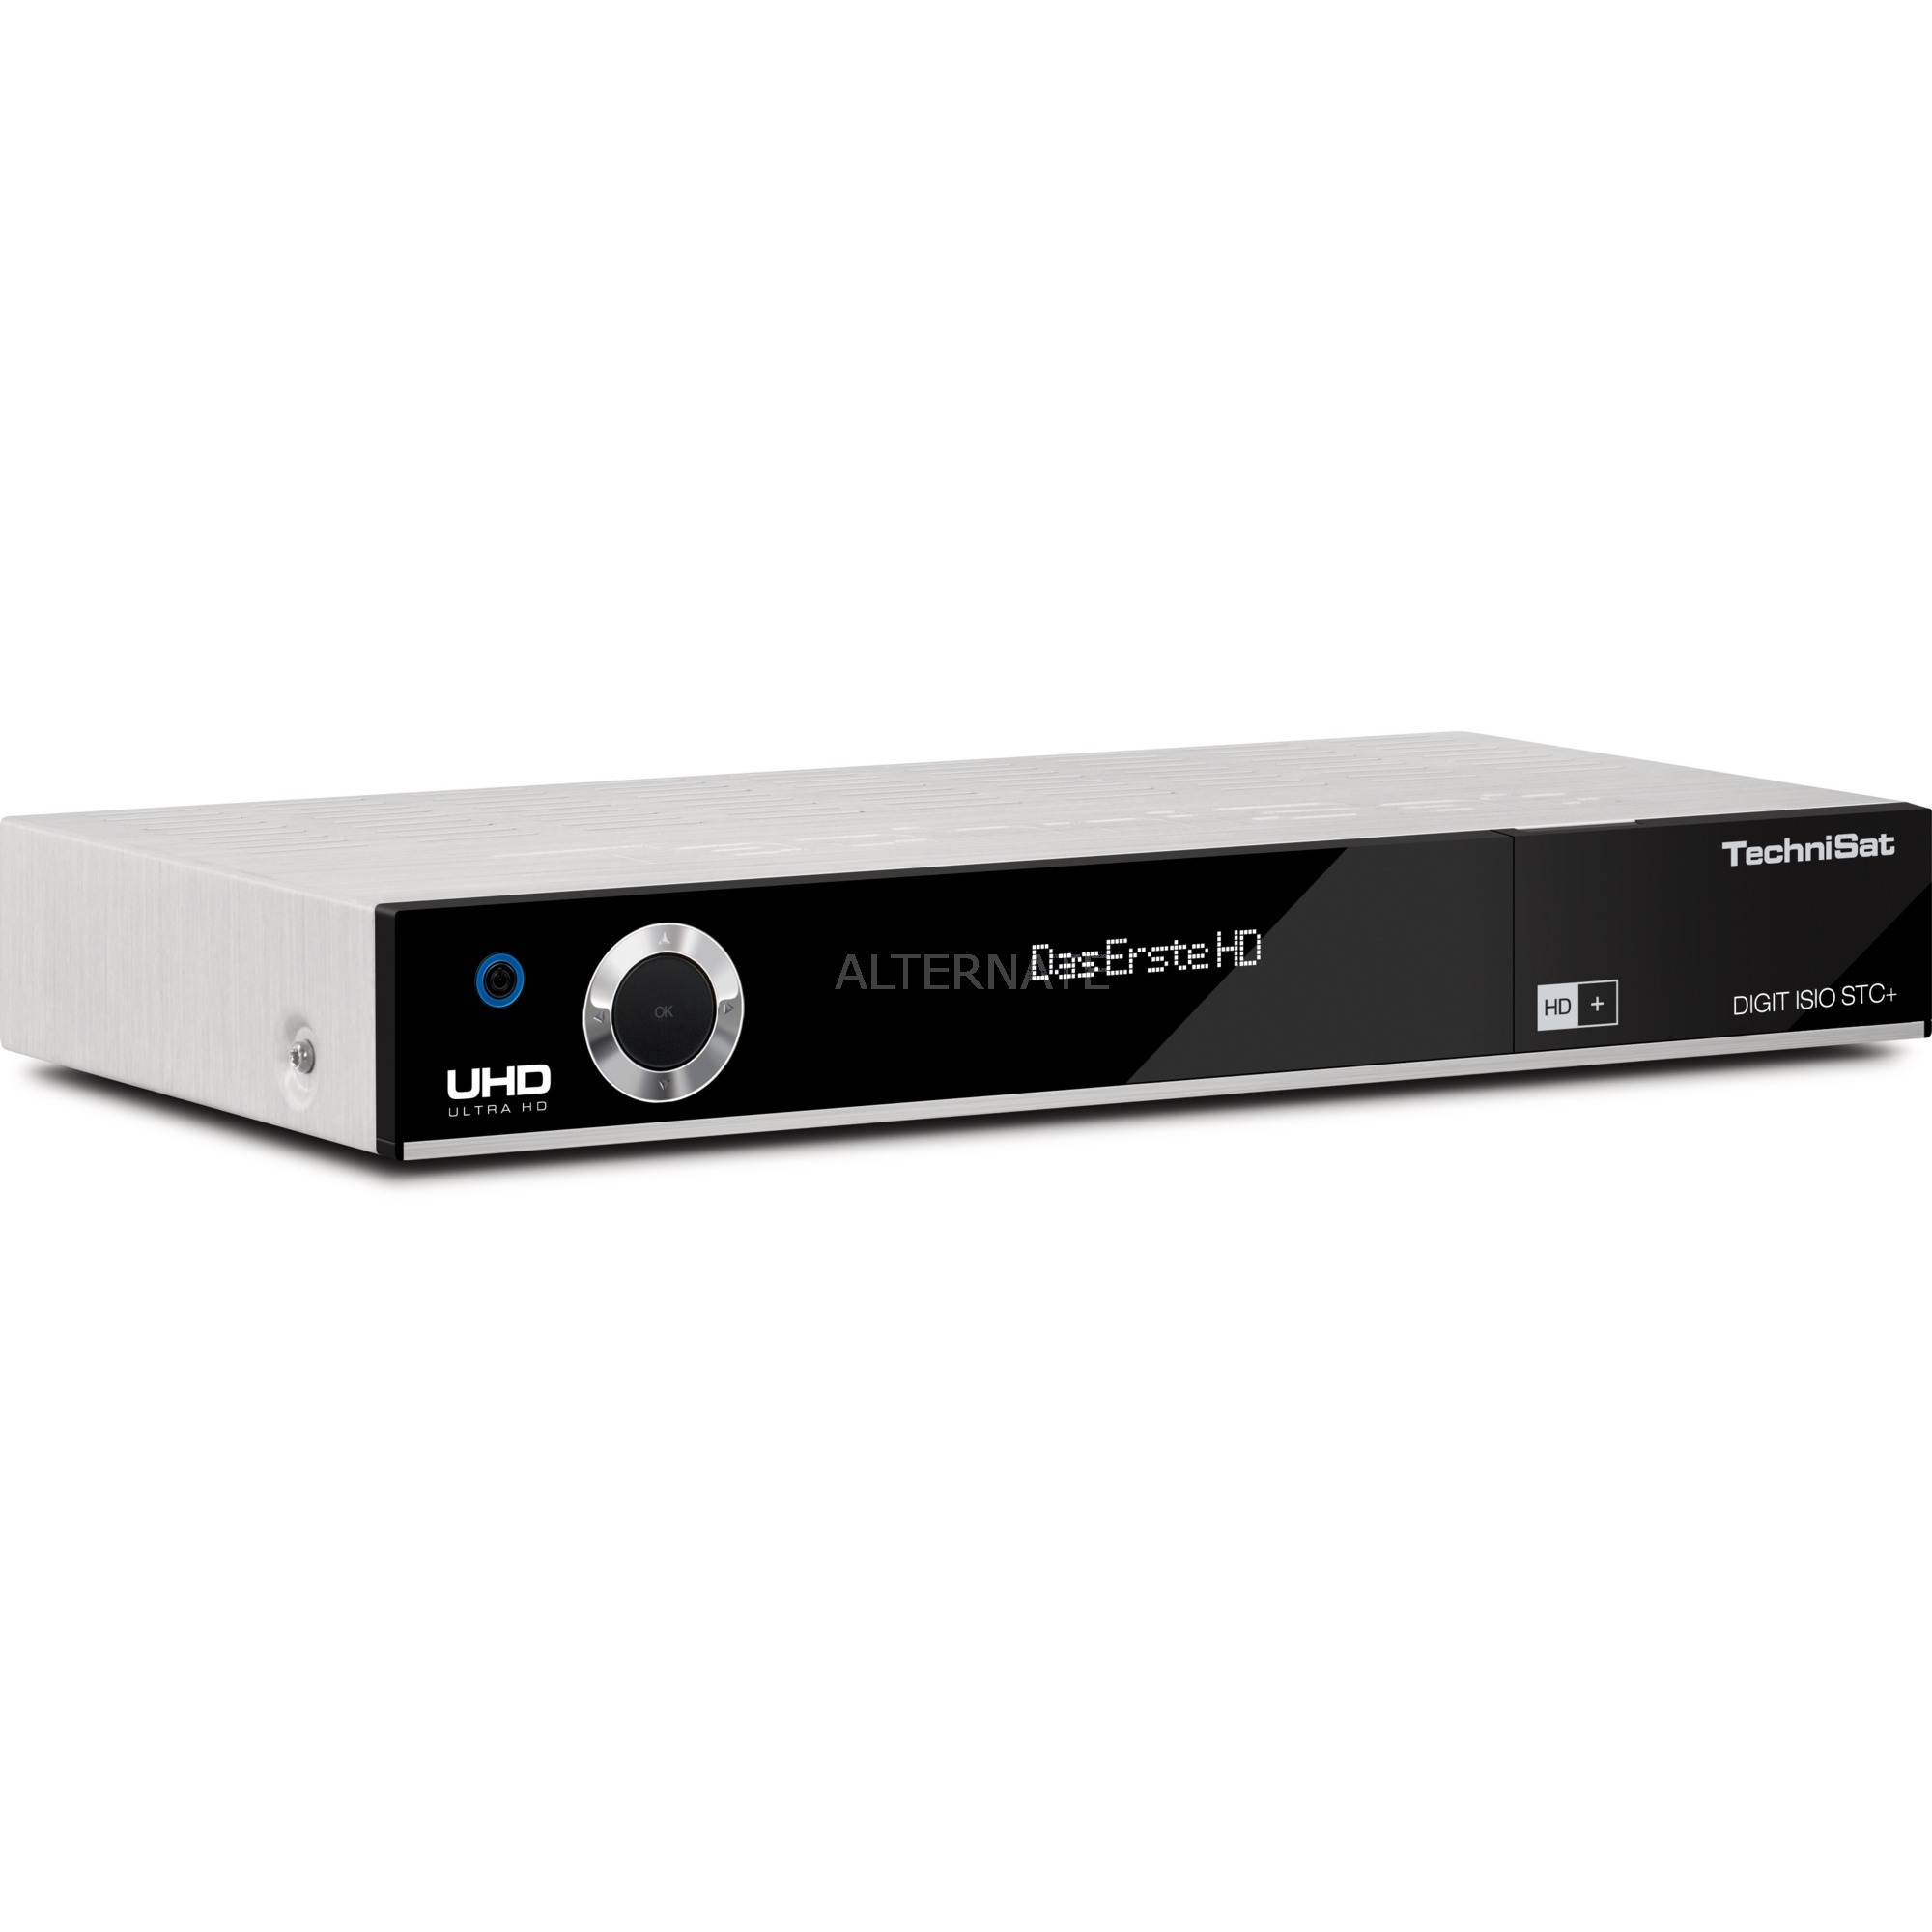 DIGIT ISIO STC+ Satellite Argent TV set-top boxe, Sat-/Kabel-/Terr.-Receiver